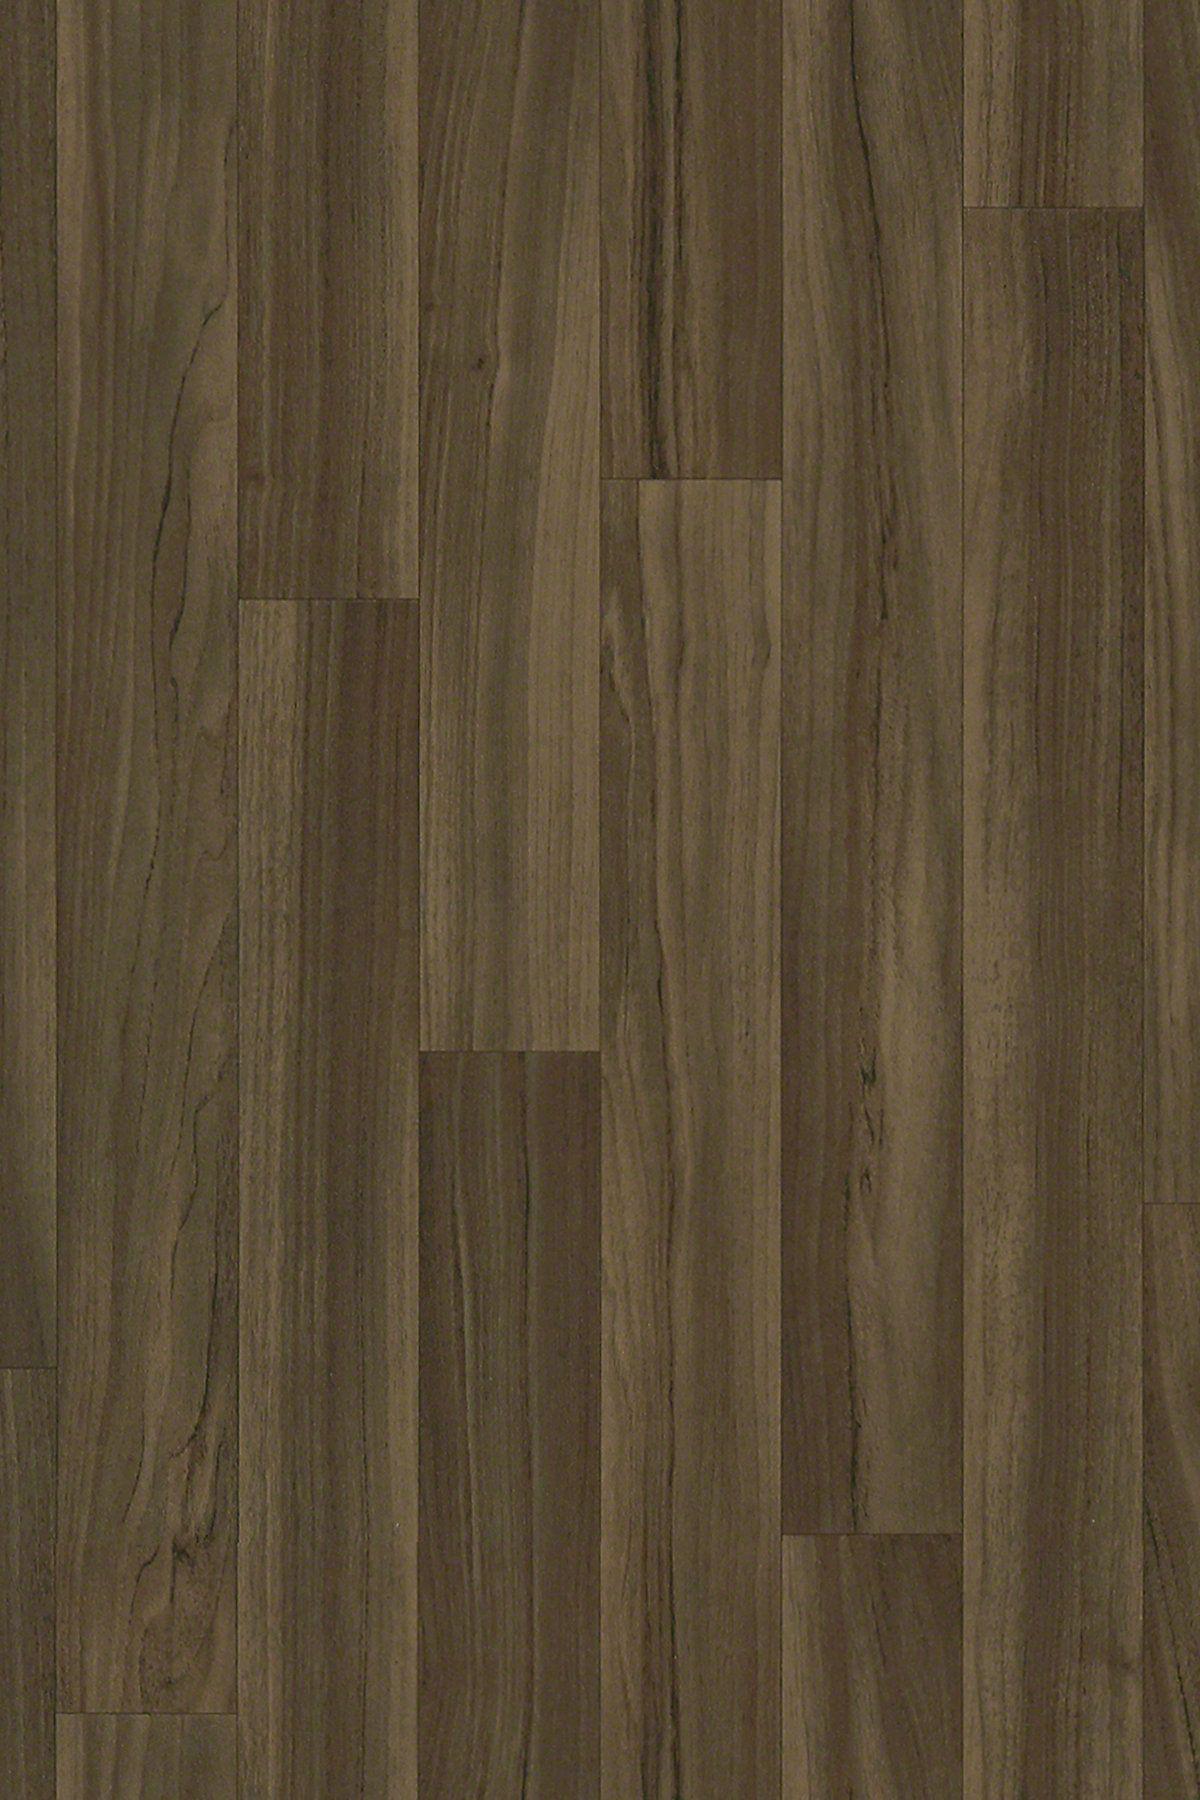 Living Quarters Minnesota Vinyl Flooring House Colors Plank